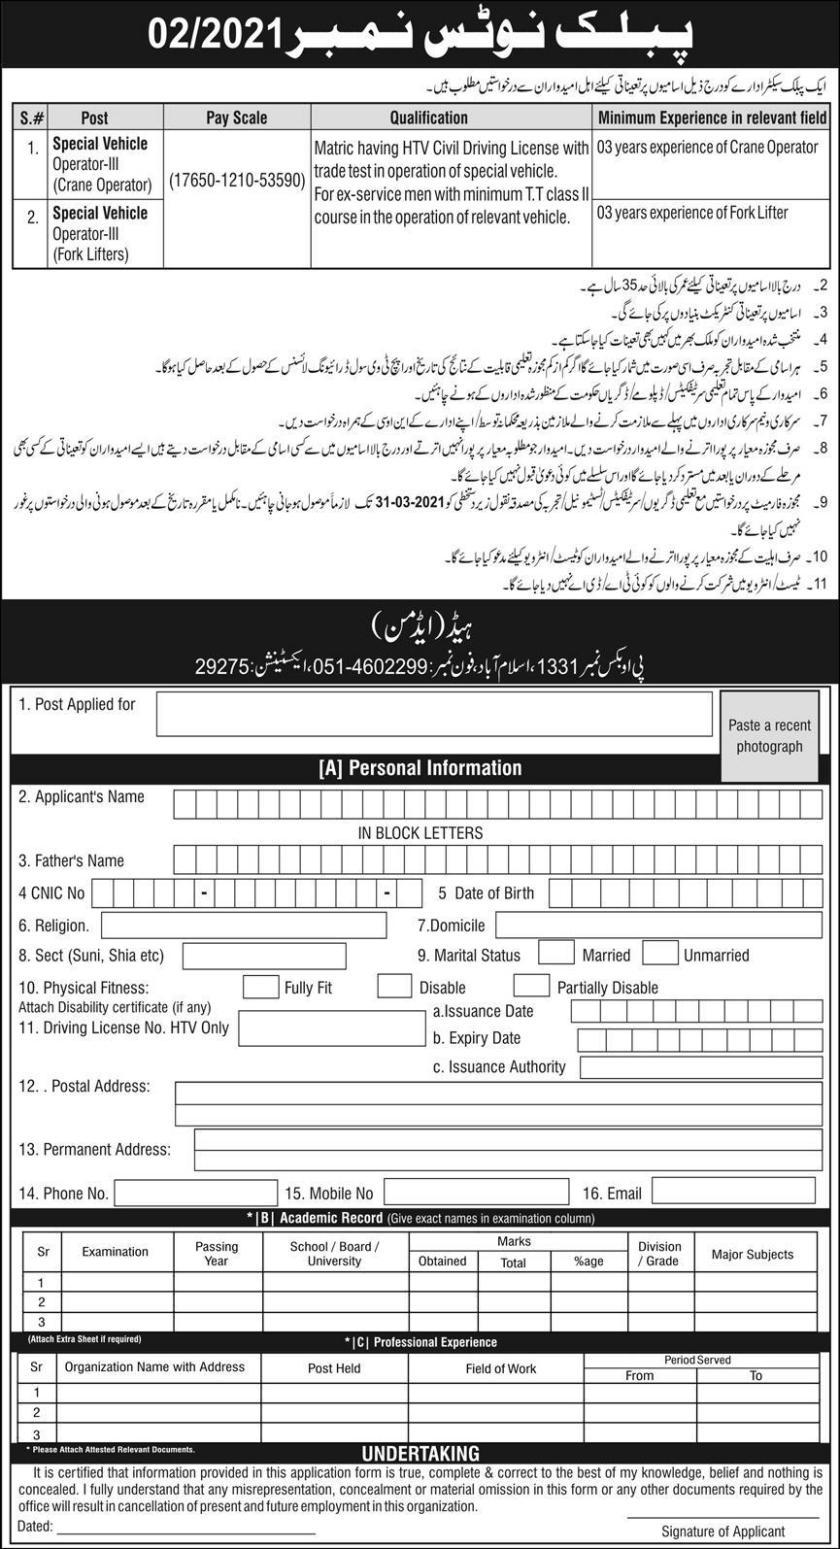 PO Box 1331 Islamabad Jobs 2021